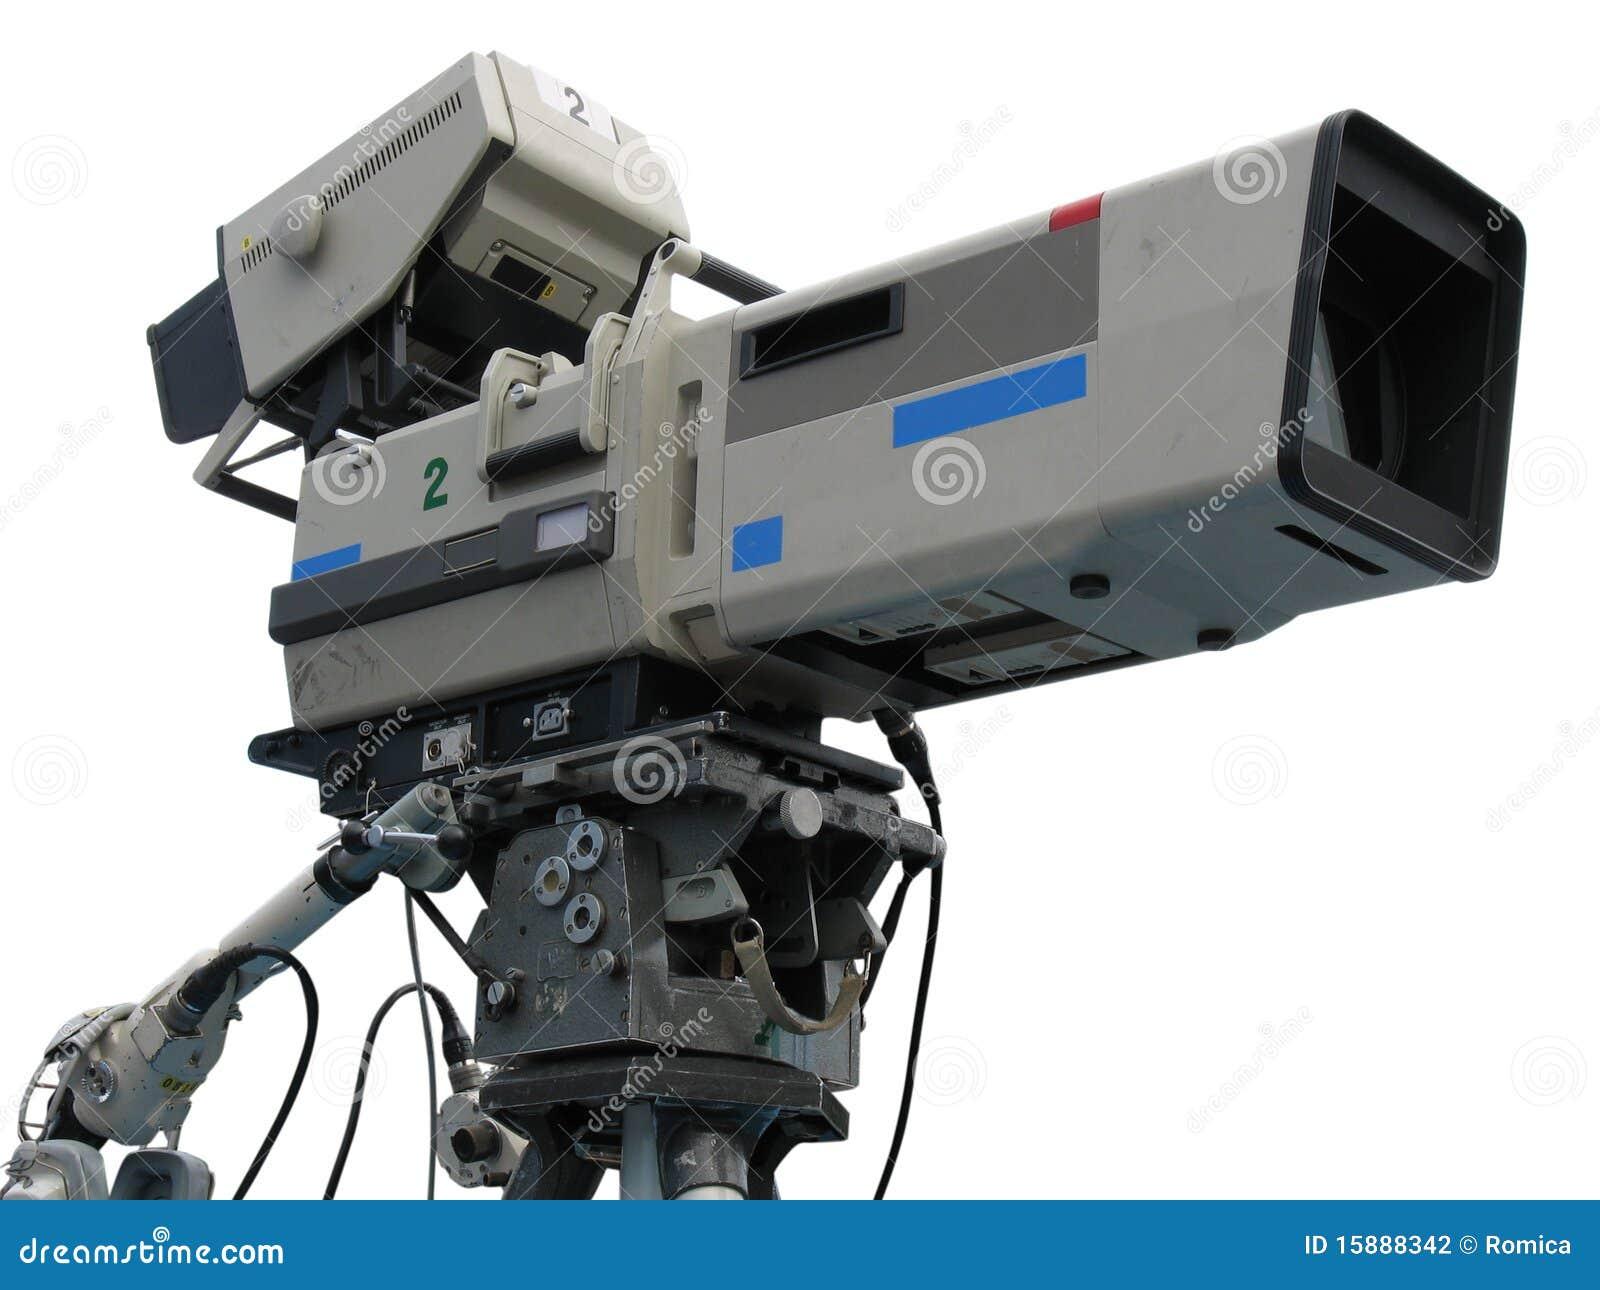 Tv professional studio digital video camera stock - Tv in camera ...